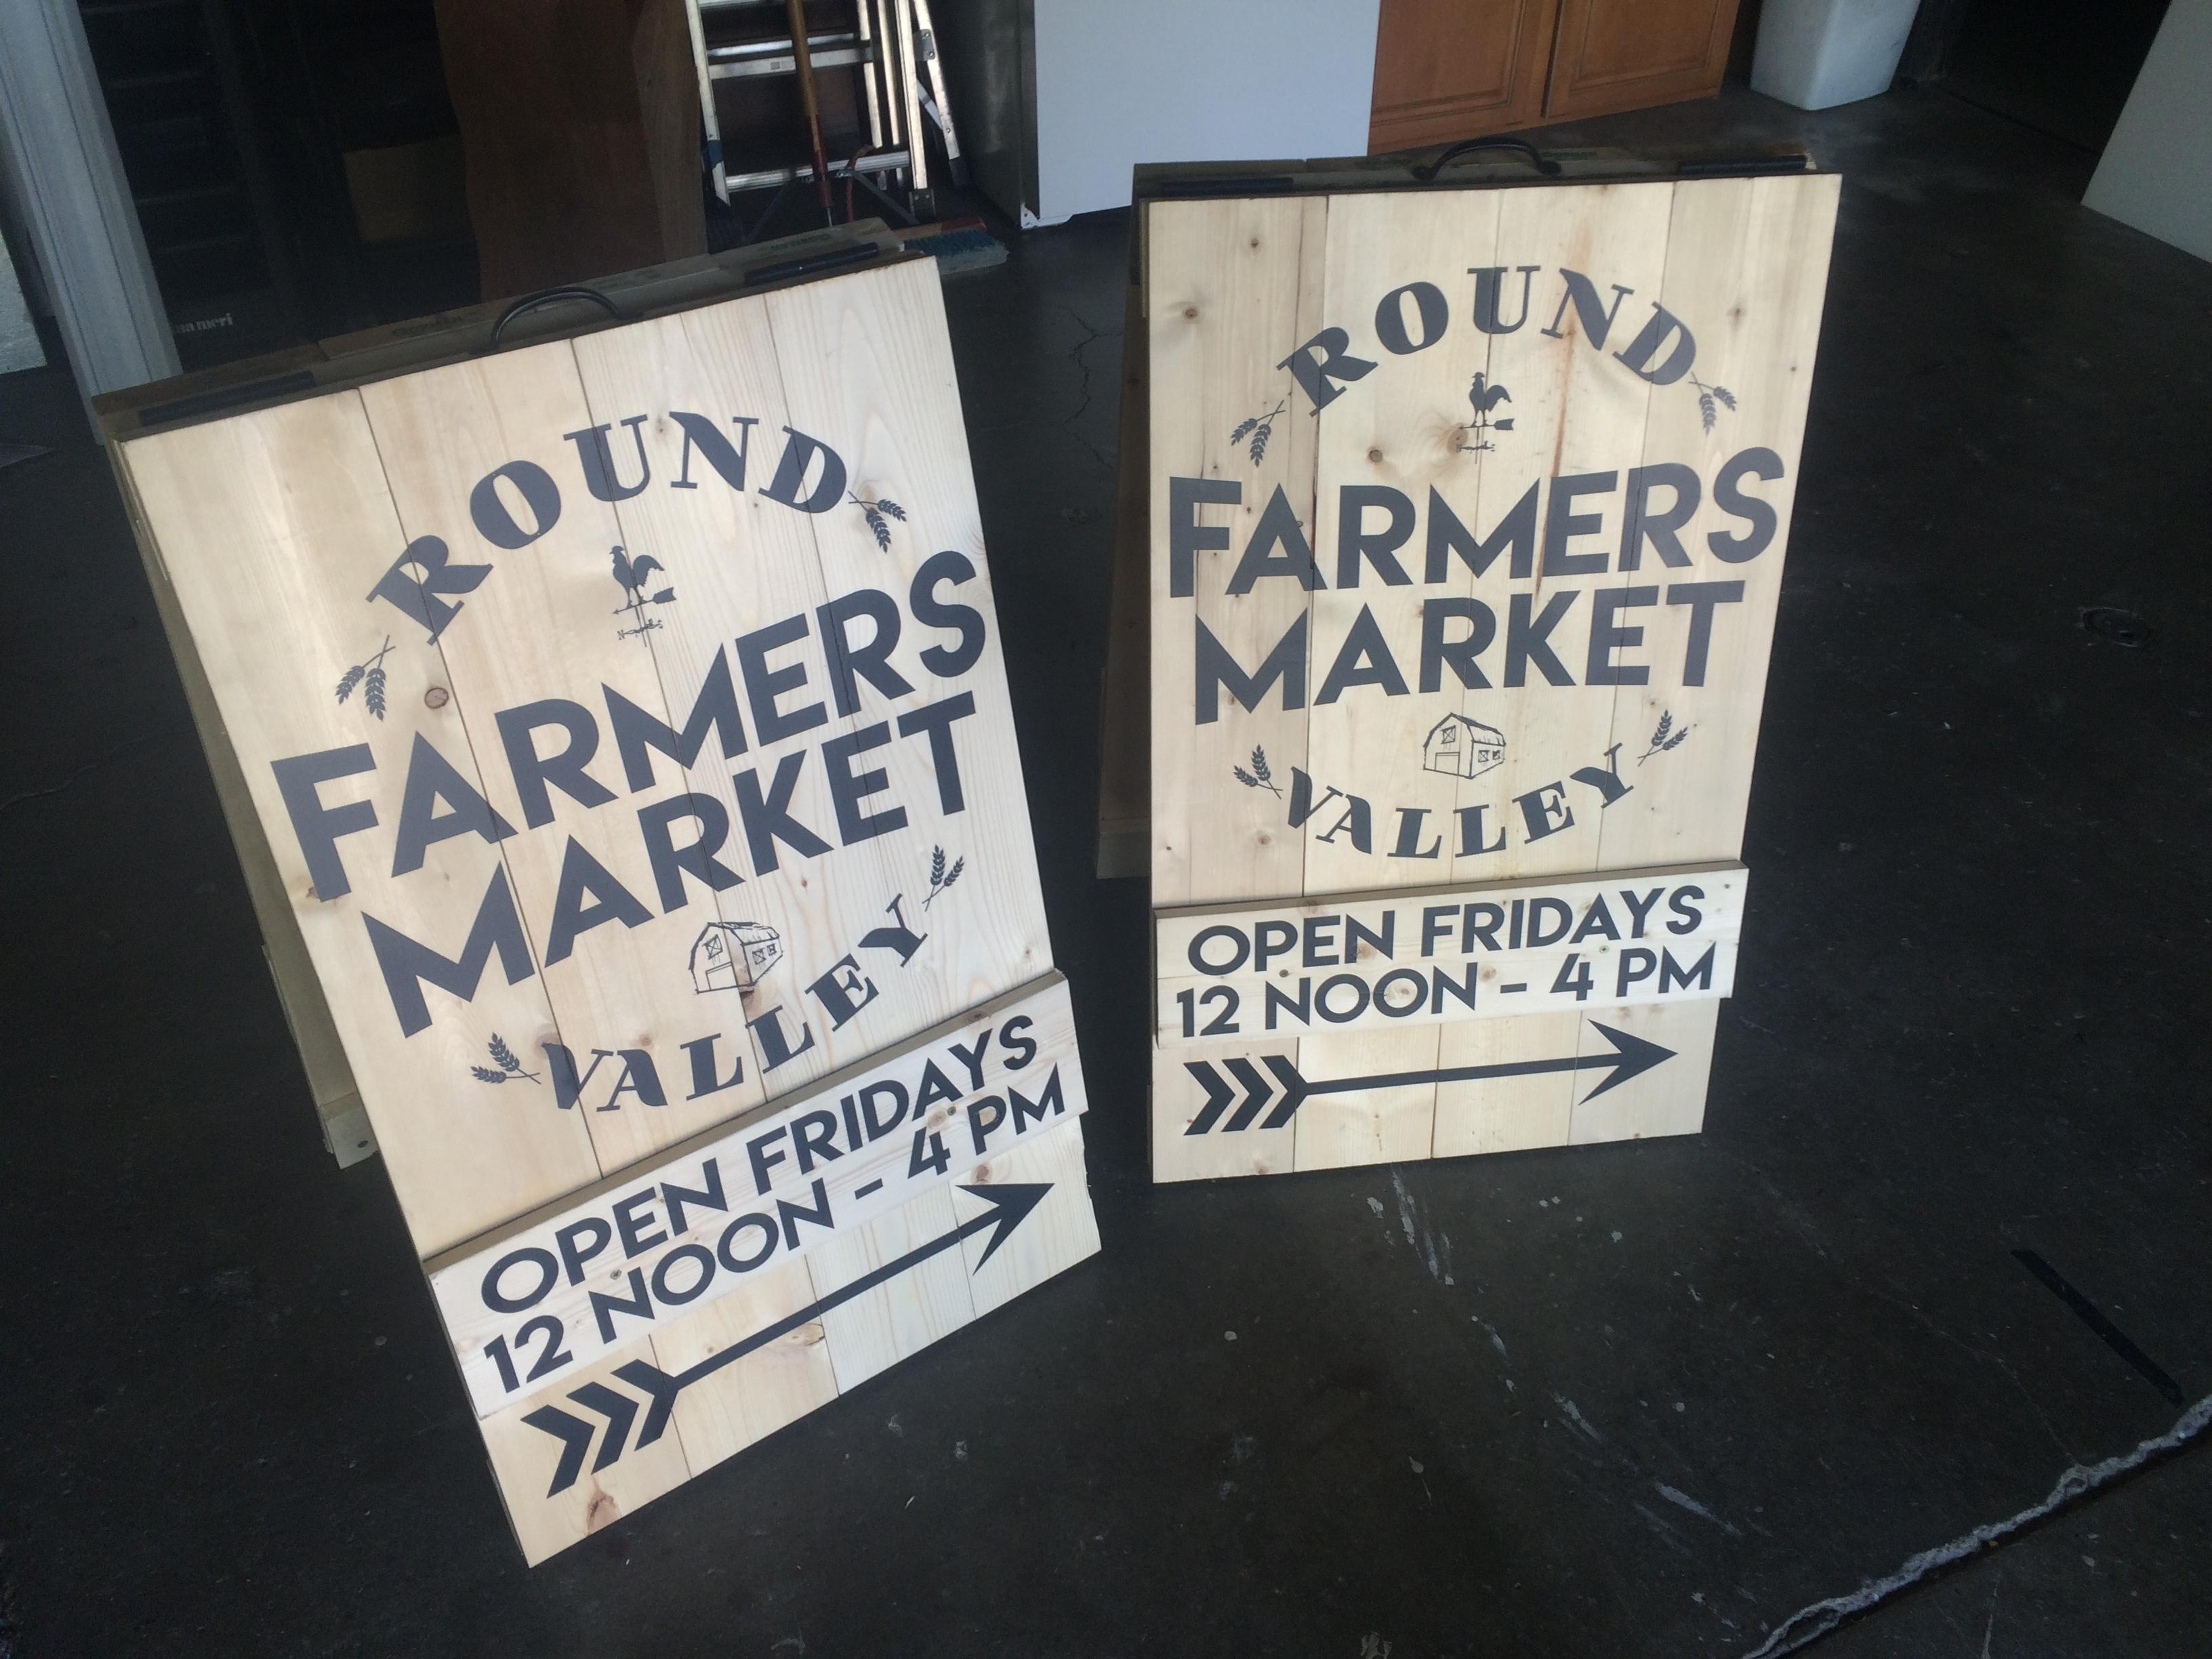 Round Farmers Market